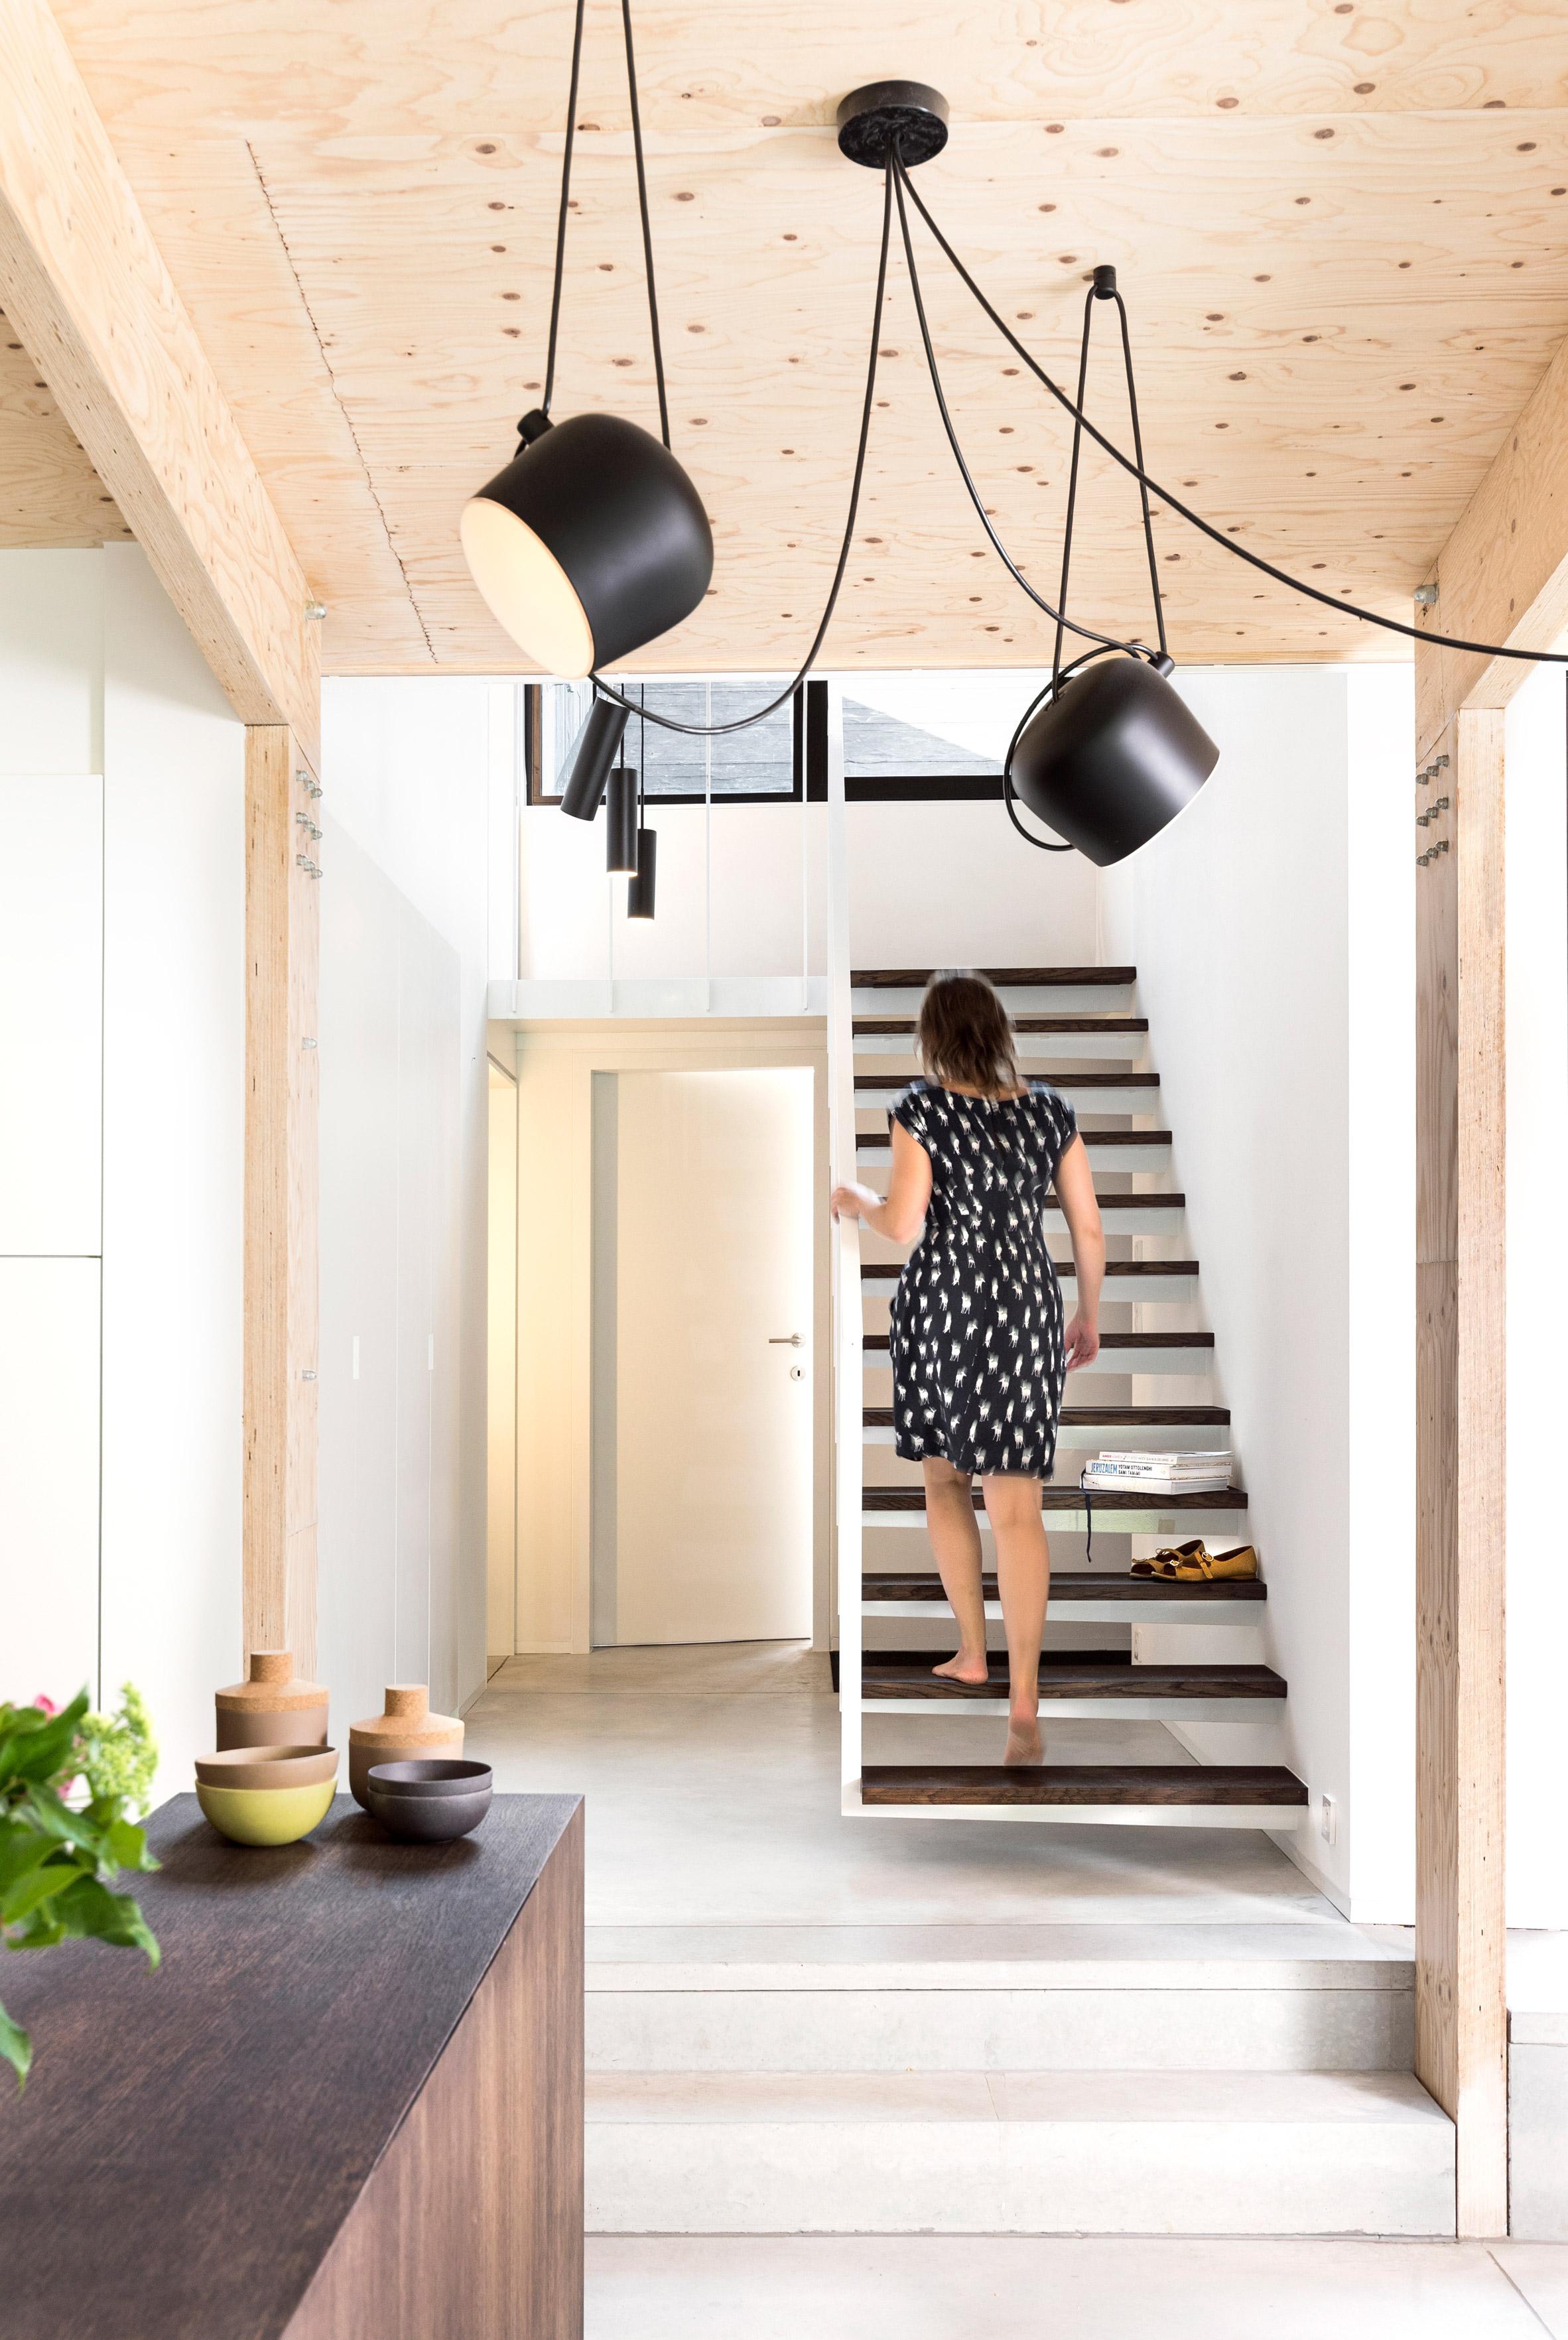 architecture-semi-detached-house-with-an-outdoor-areadesign-studia-interiors-osnovadesign-osnova-poltava_06